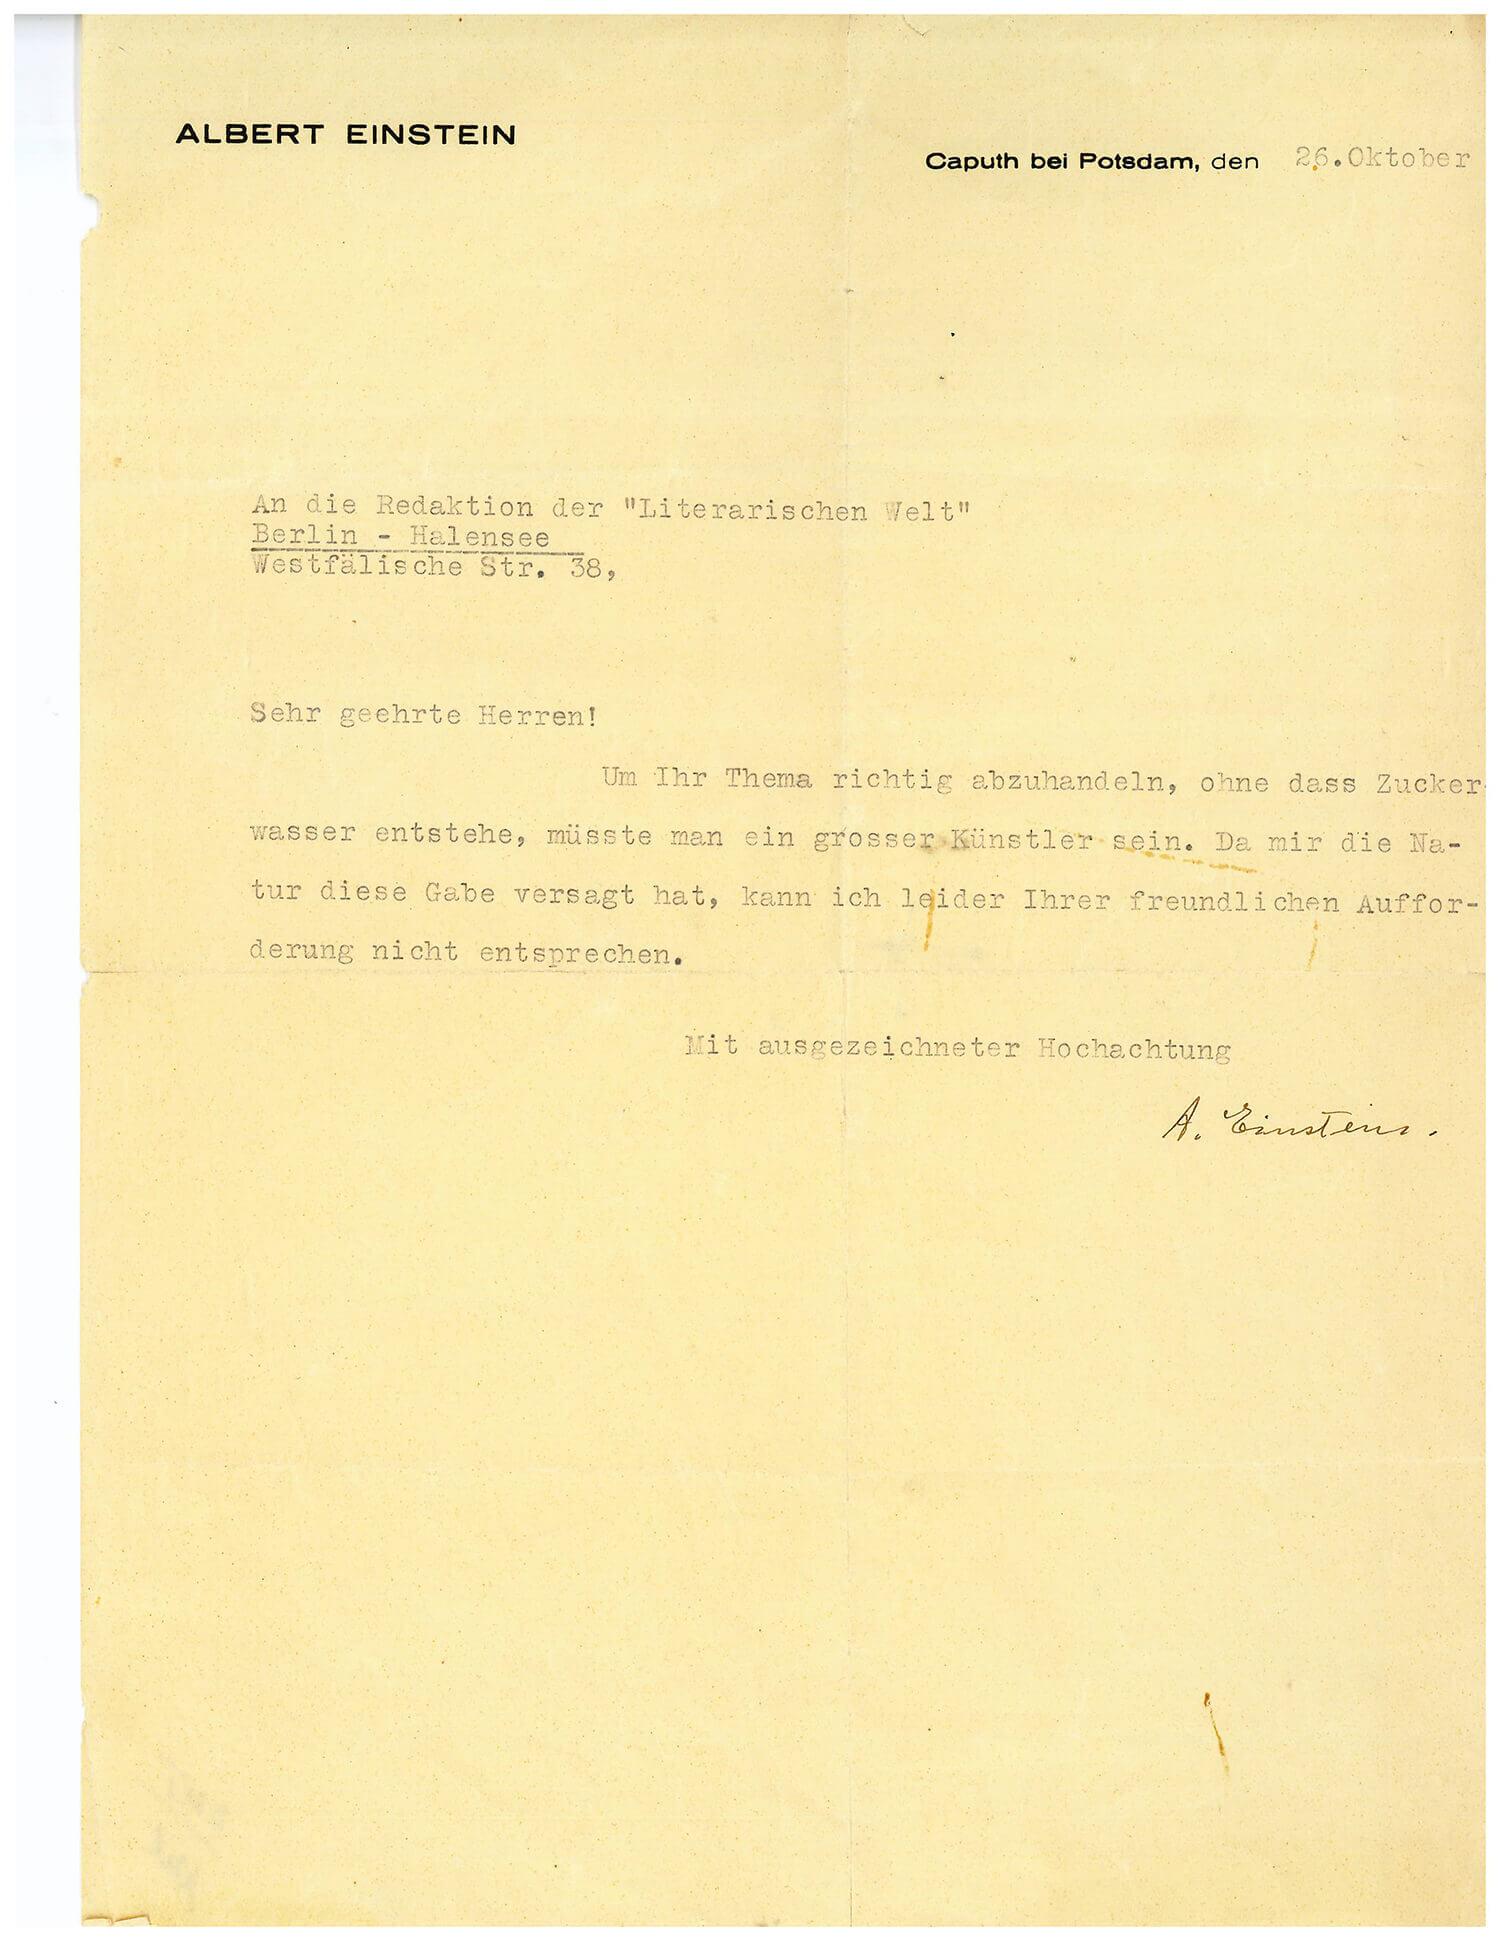 178. A LETTER SIGNED BY ALBERT EINSTEIN